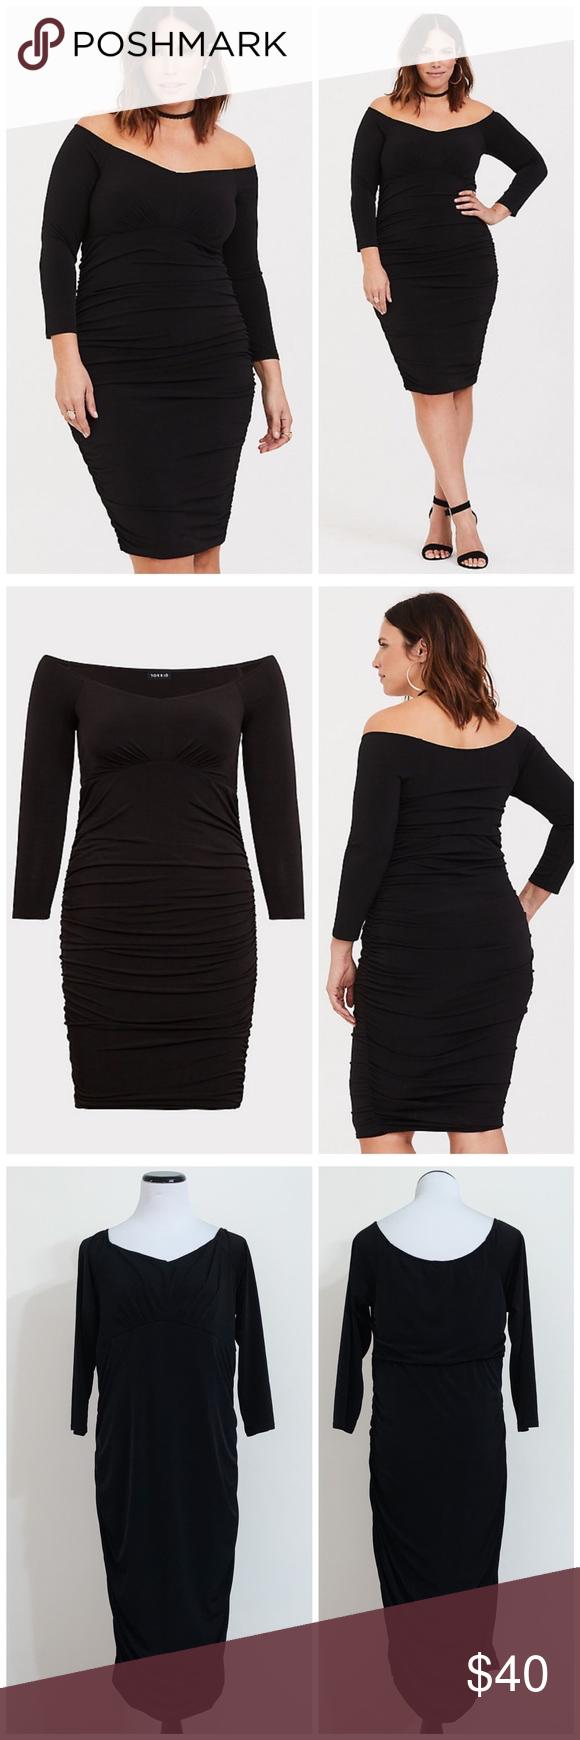 Torrid Black Ruched Studio Knit Bodycon Dress 2x Knitted Bodycon Dress Stretchy Bodycon Dress Dresses 2x [ 1740 x 580 Pixel ]